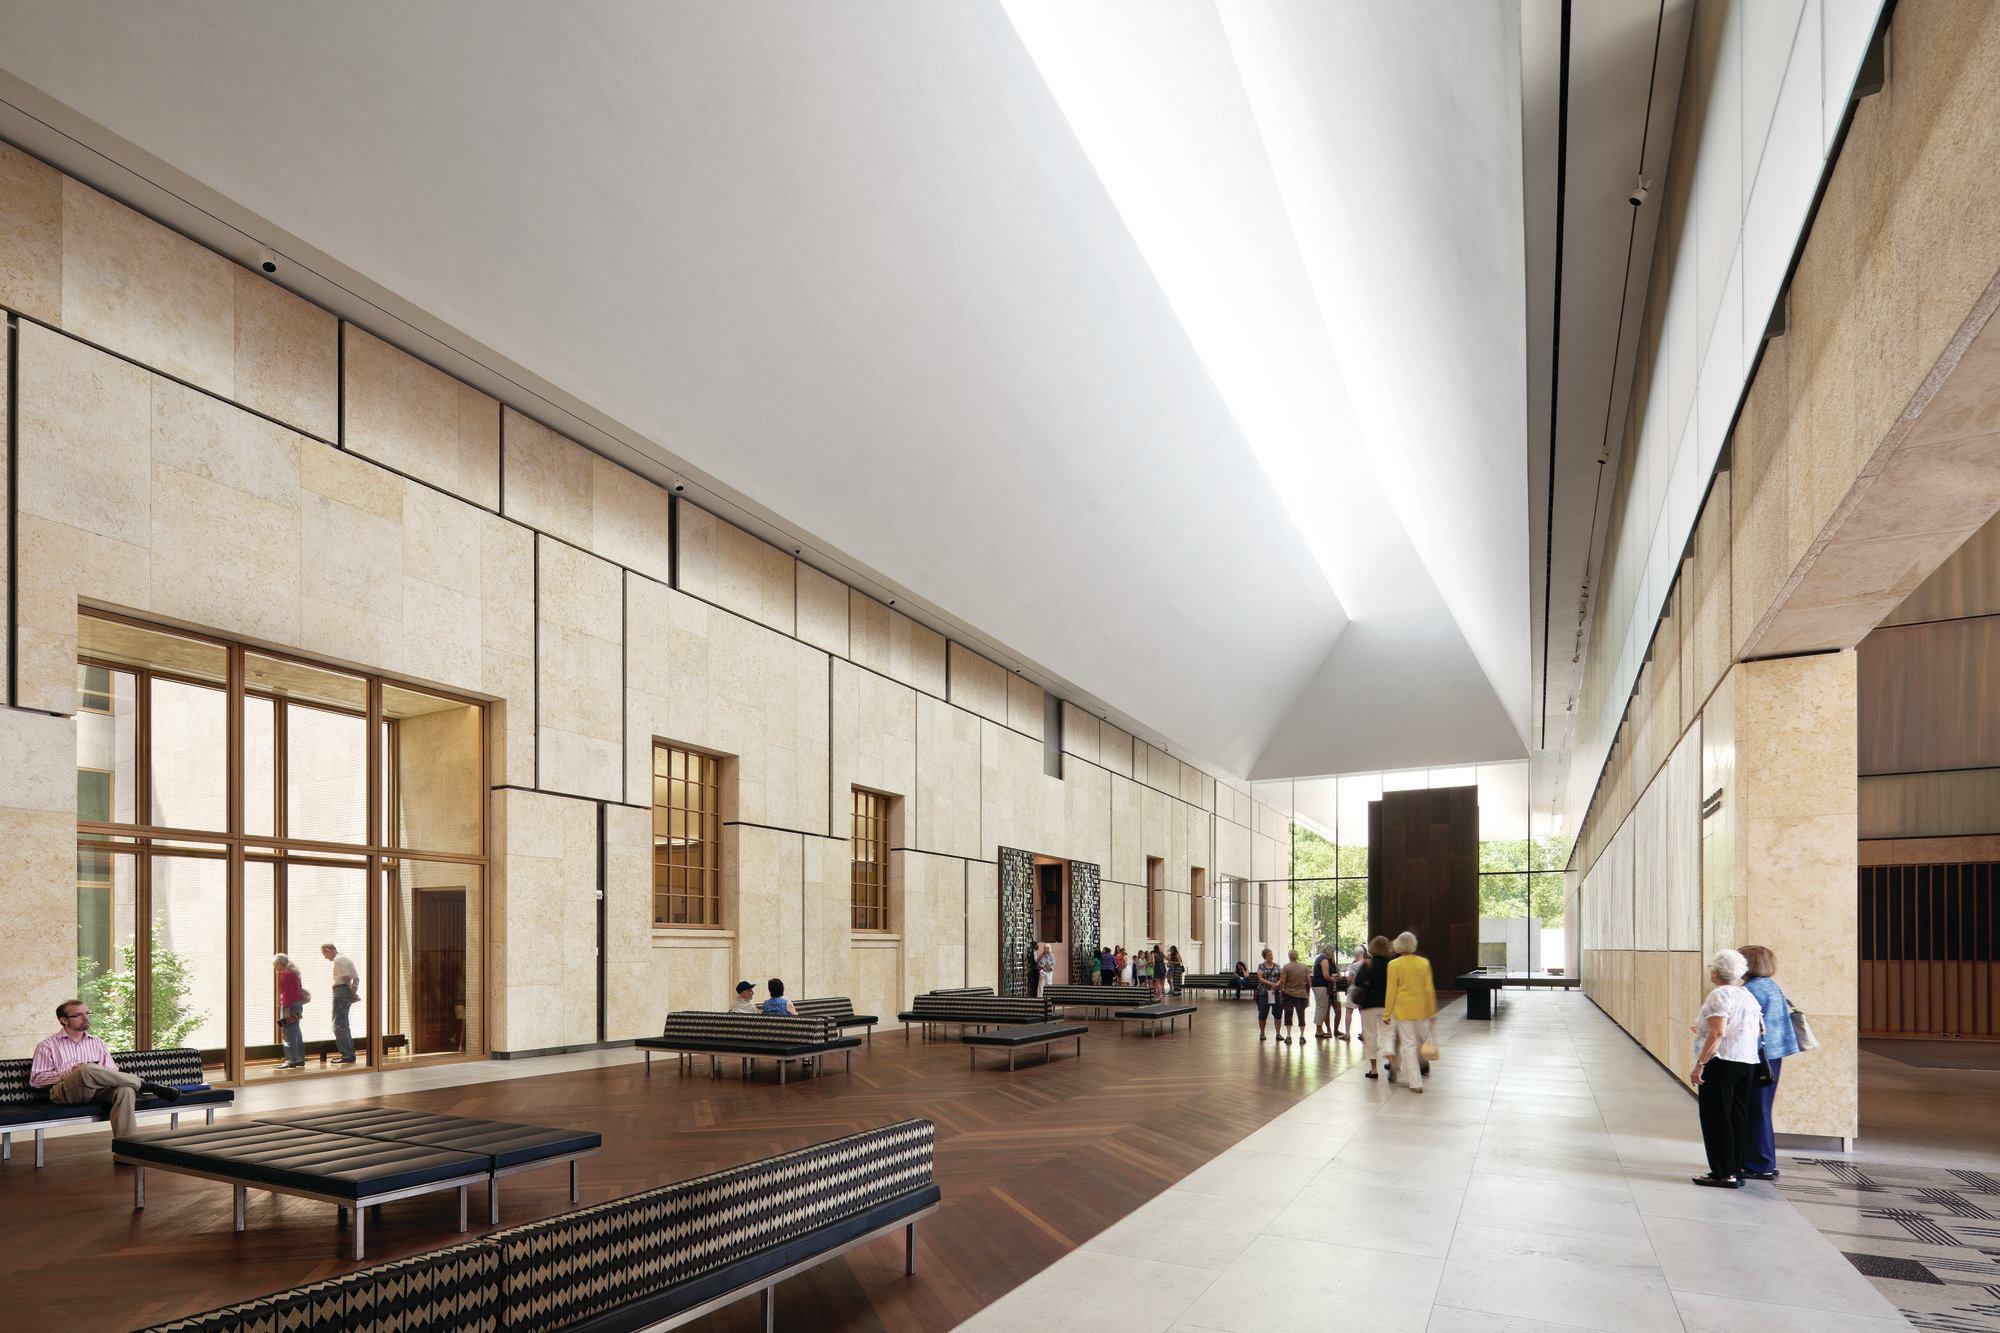 2013 AIA Honor Awards The Barnes Foundation Architect